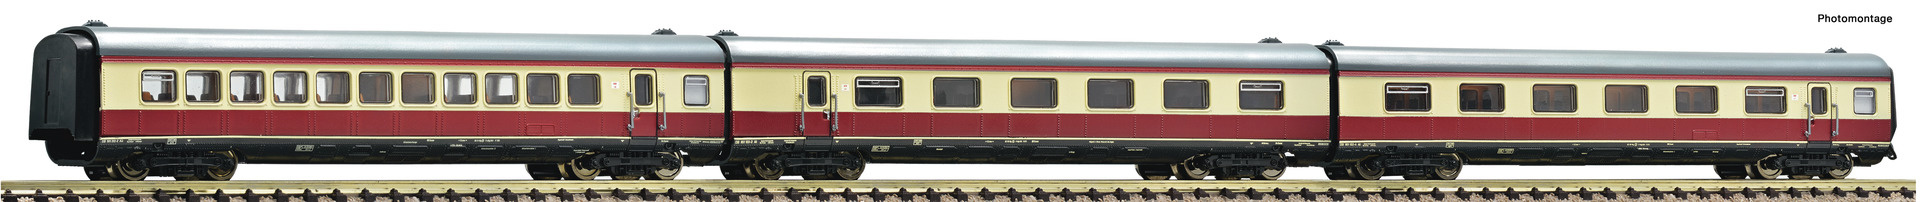 741006 Ergänzungsset BR 601-1